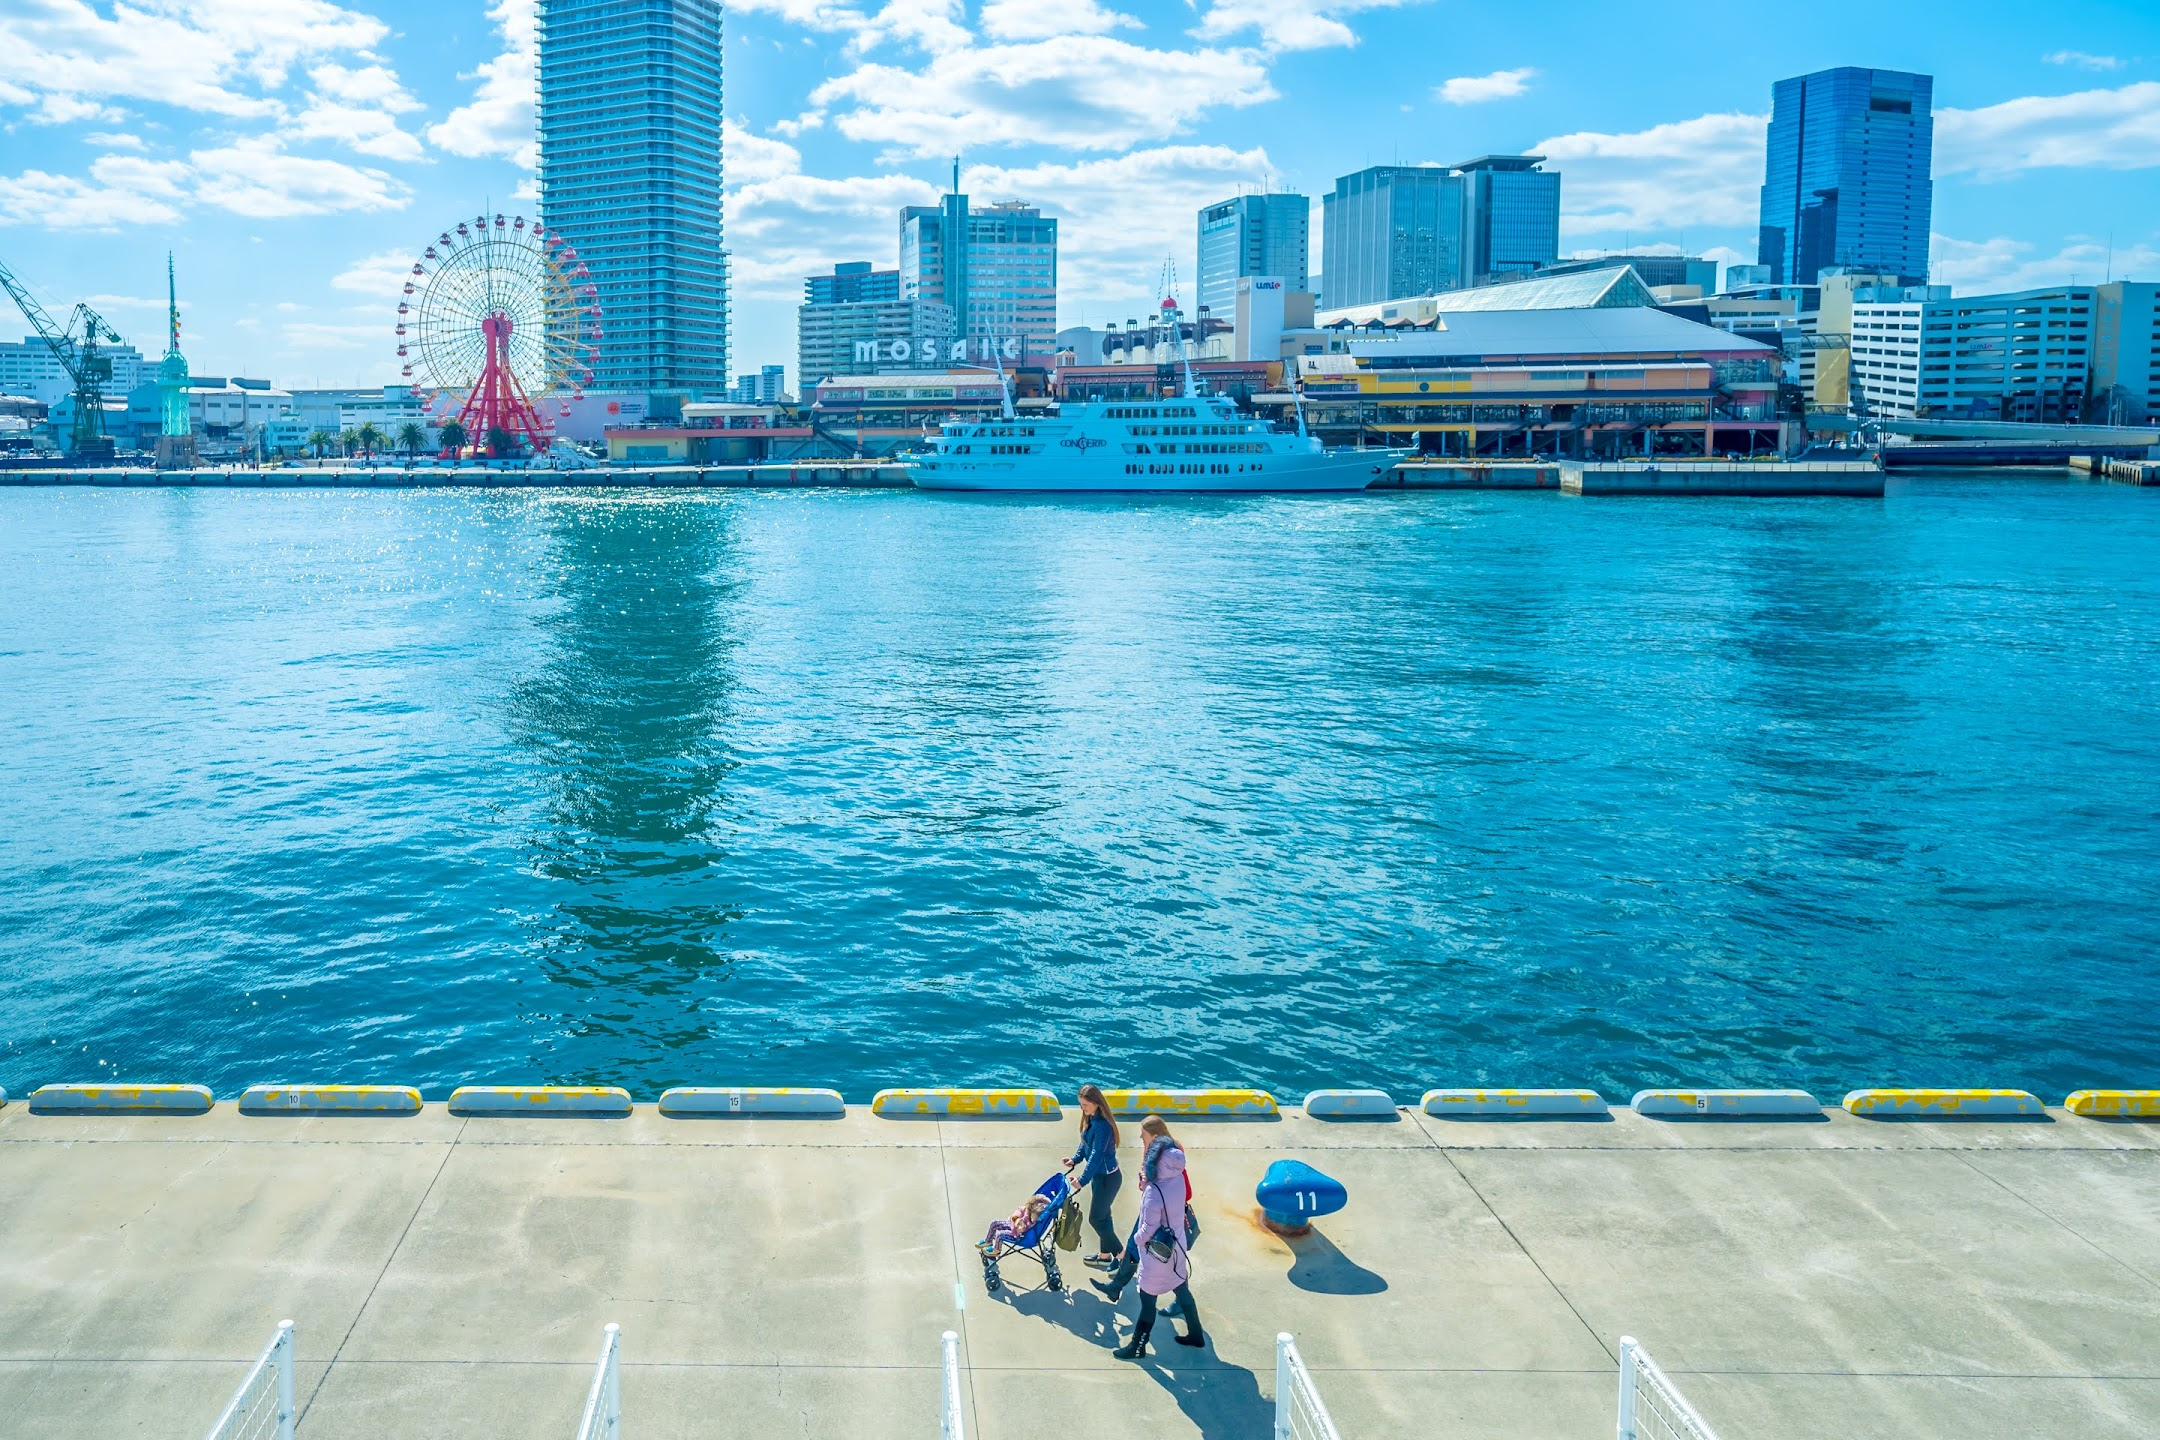 Kobe Harborland2